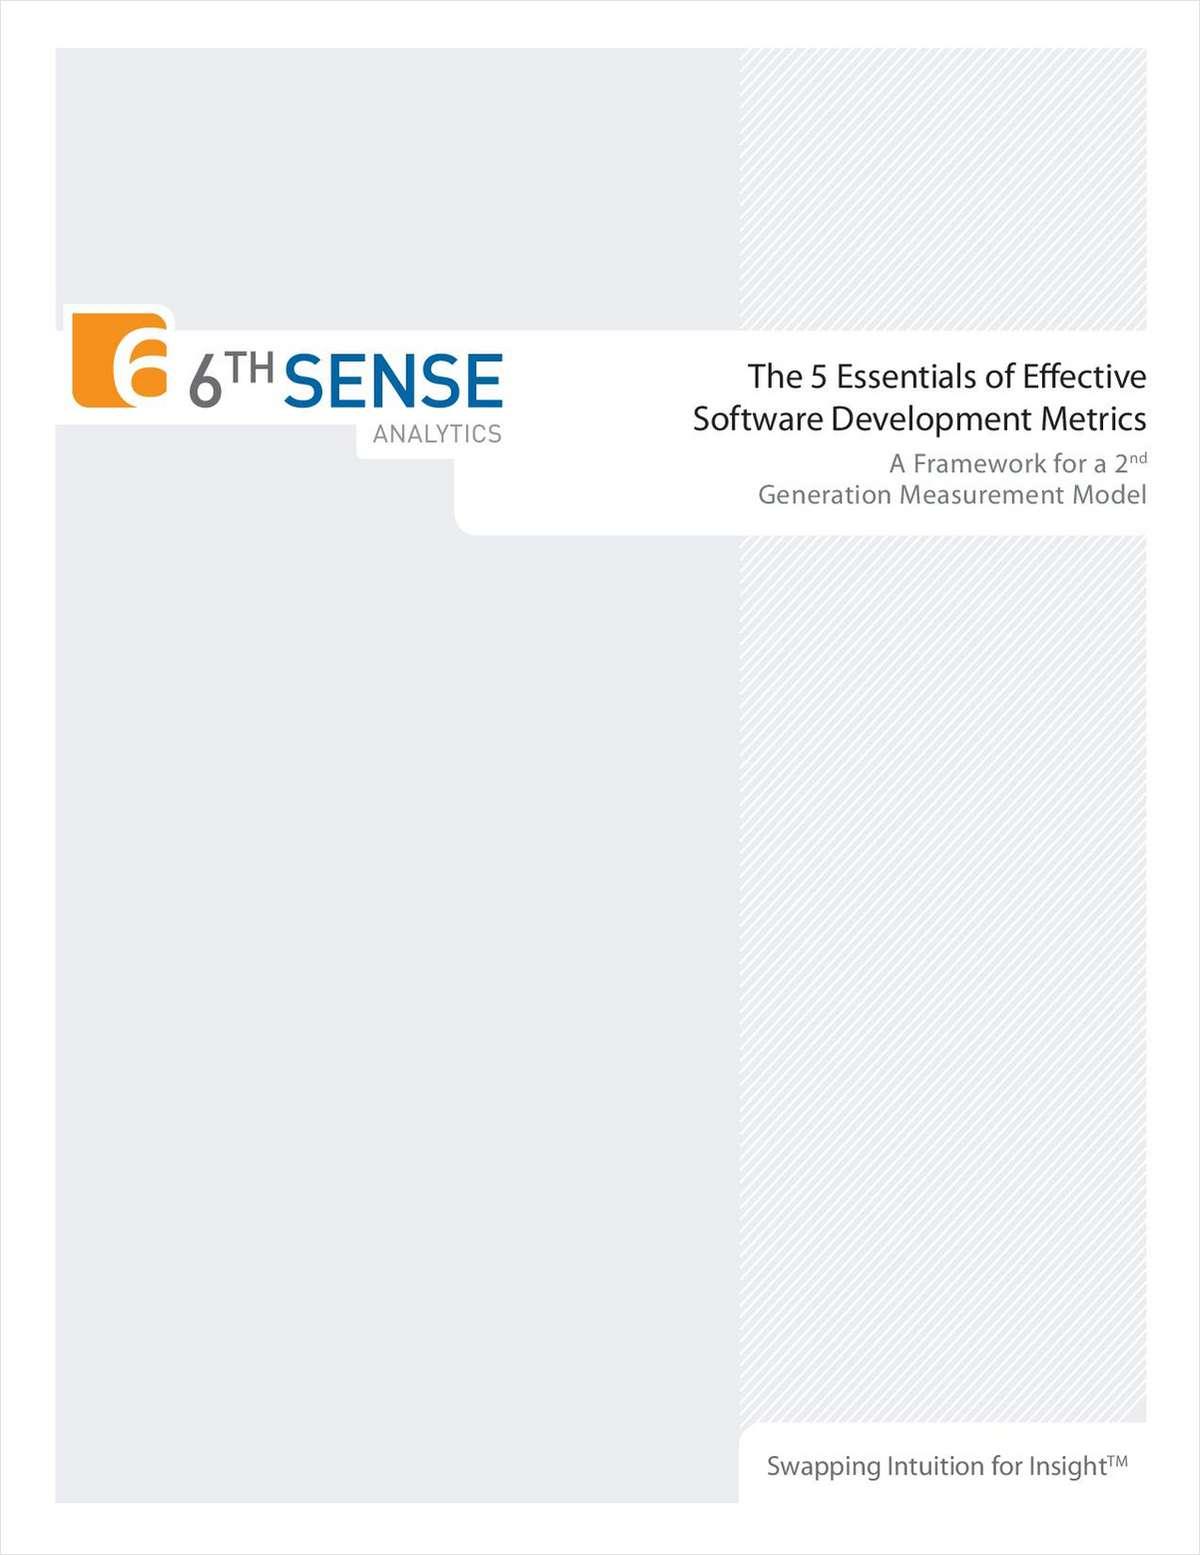 The 5 Essentials of Effective Software Development Metrics